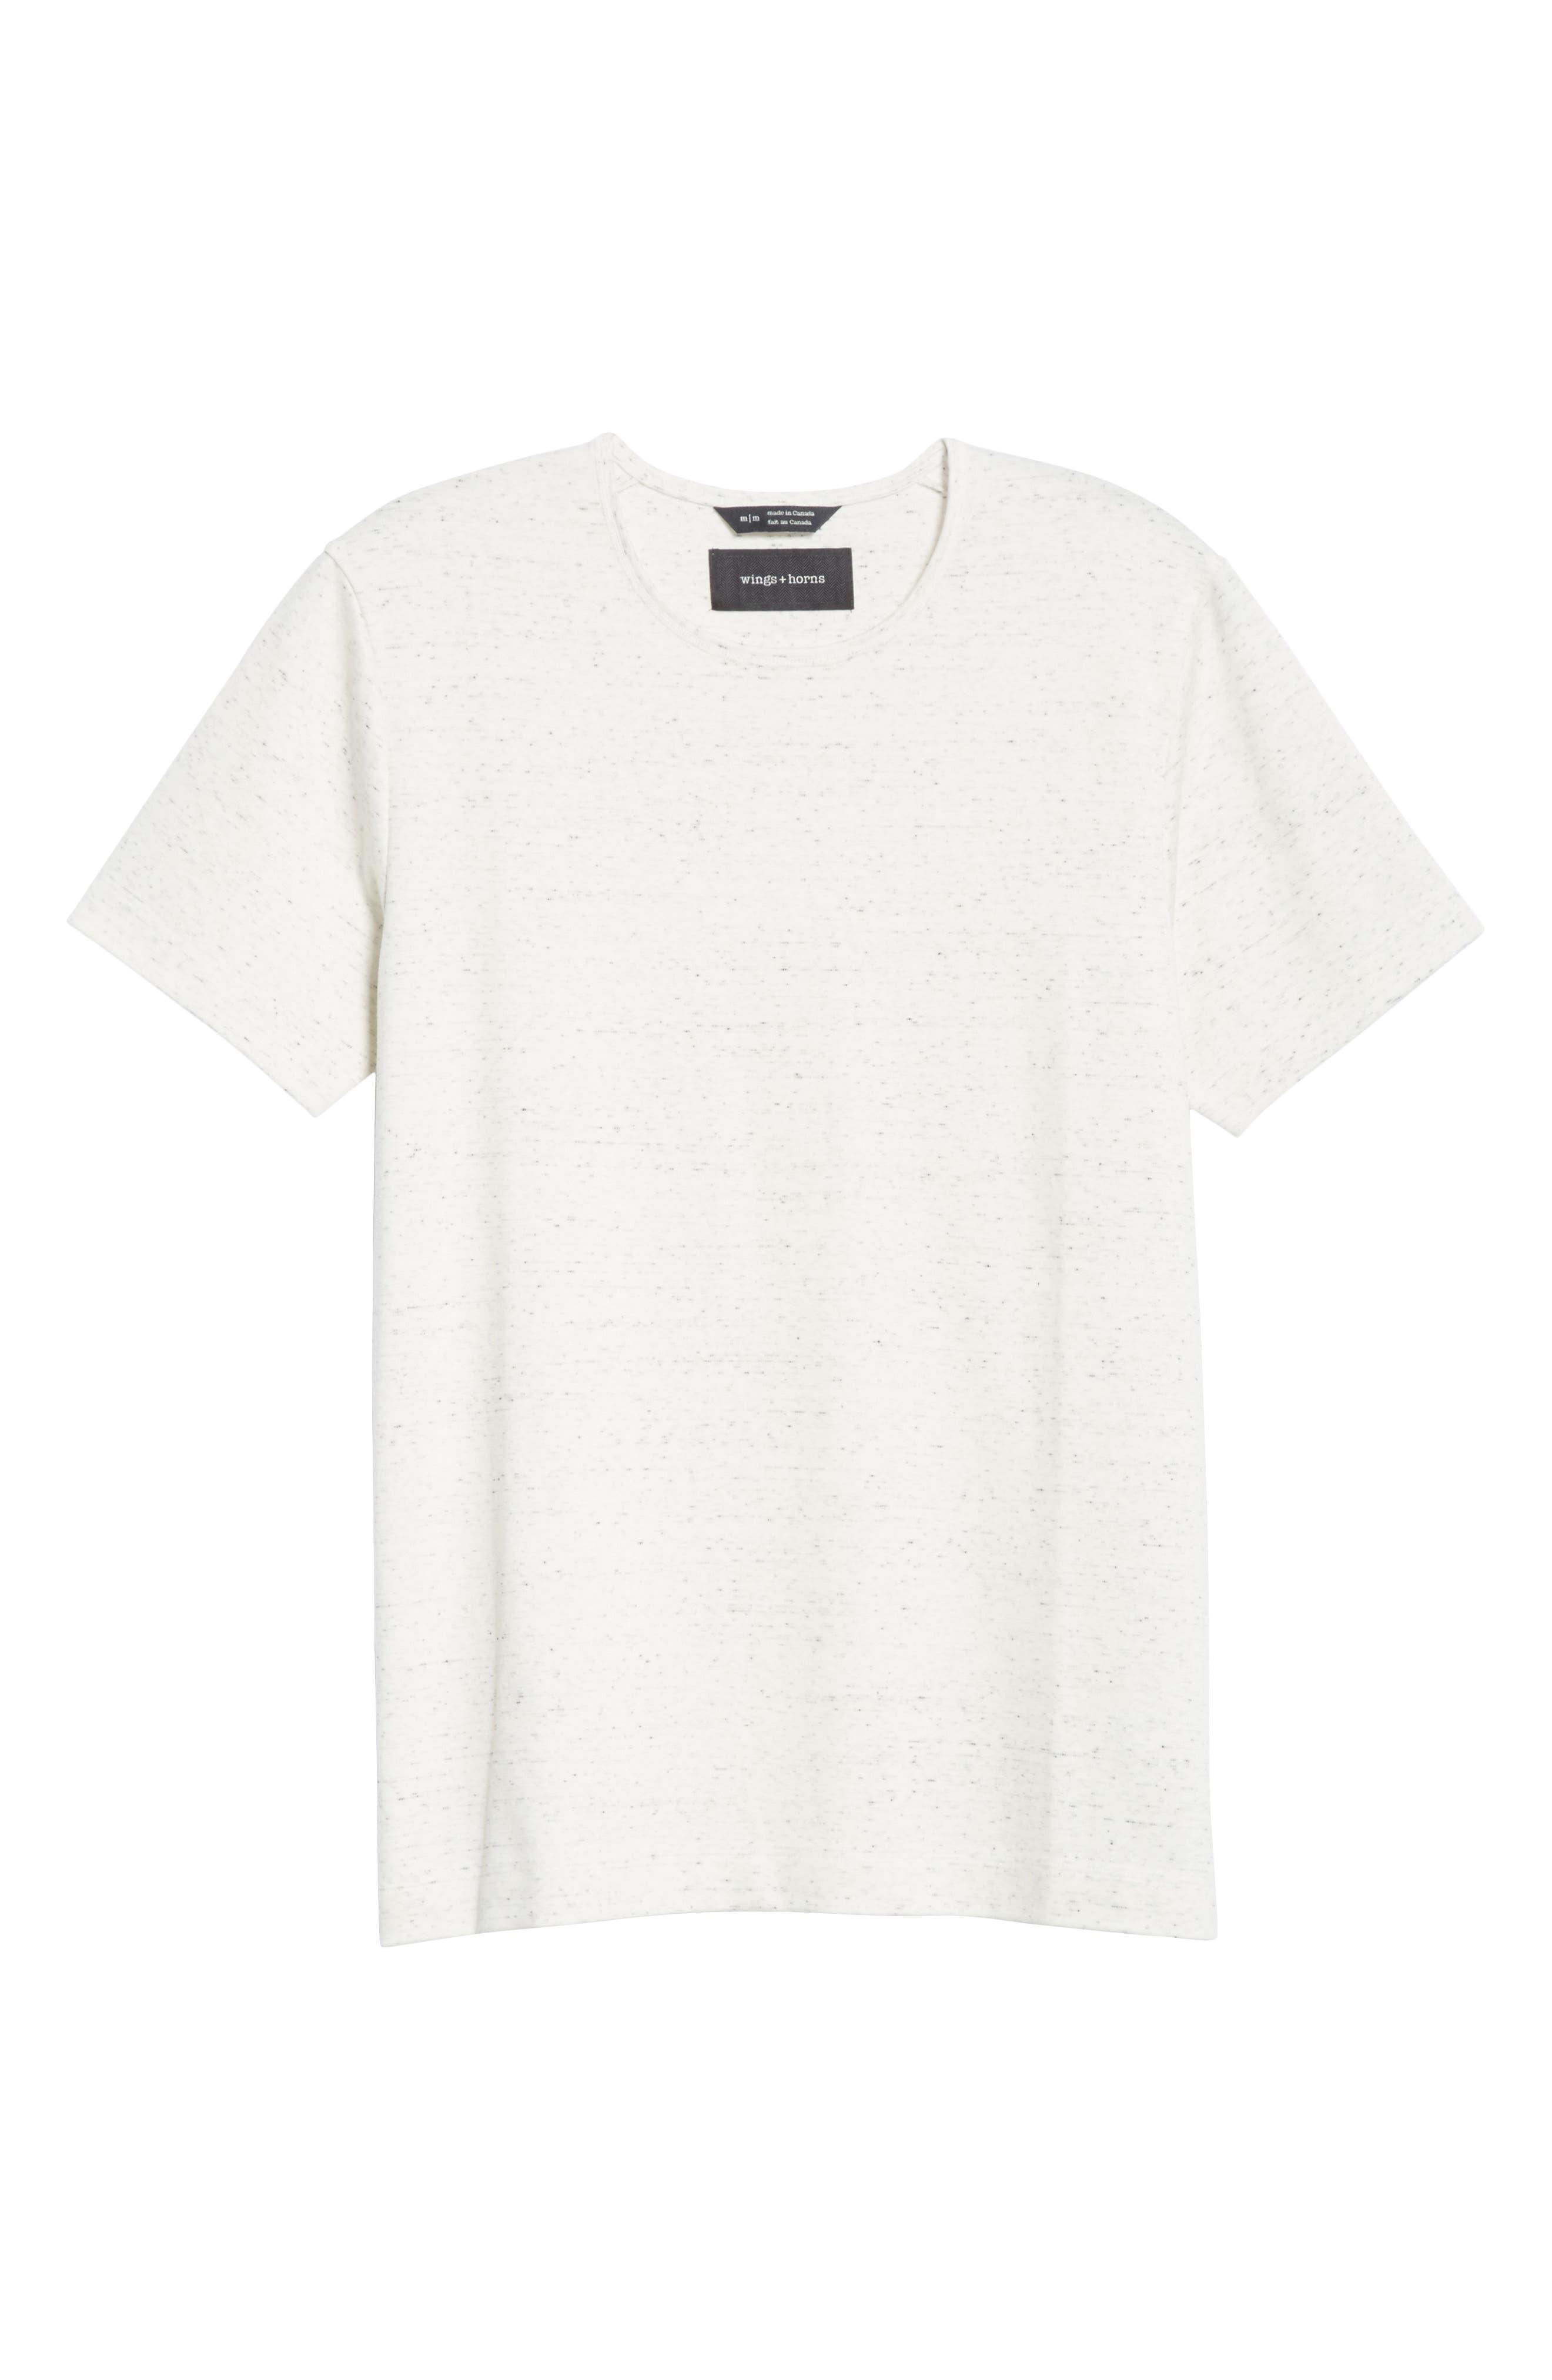 Signals T-Shirt,                             Alternate thumbnail 6, color,                             Static White